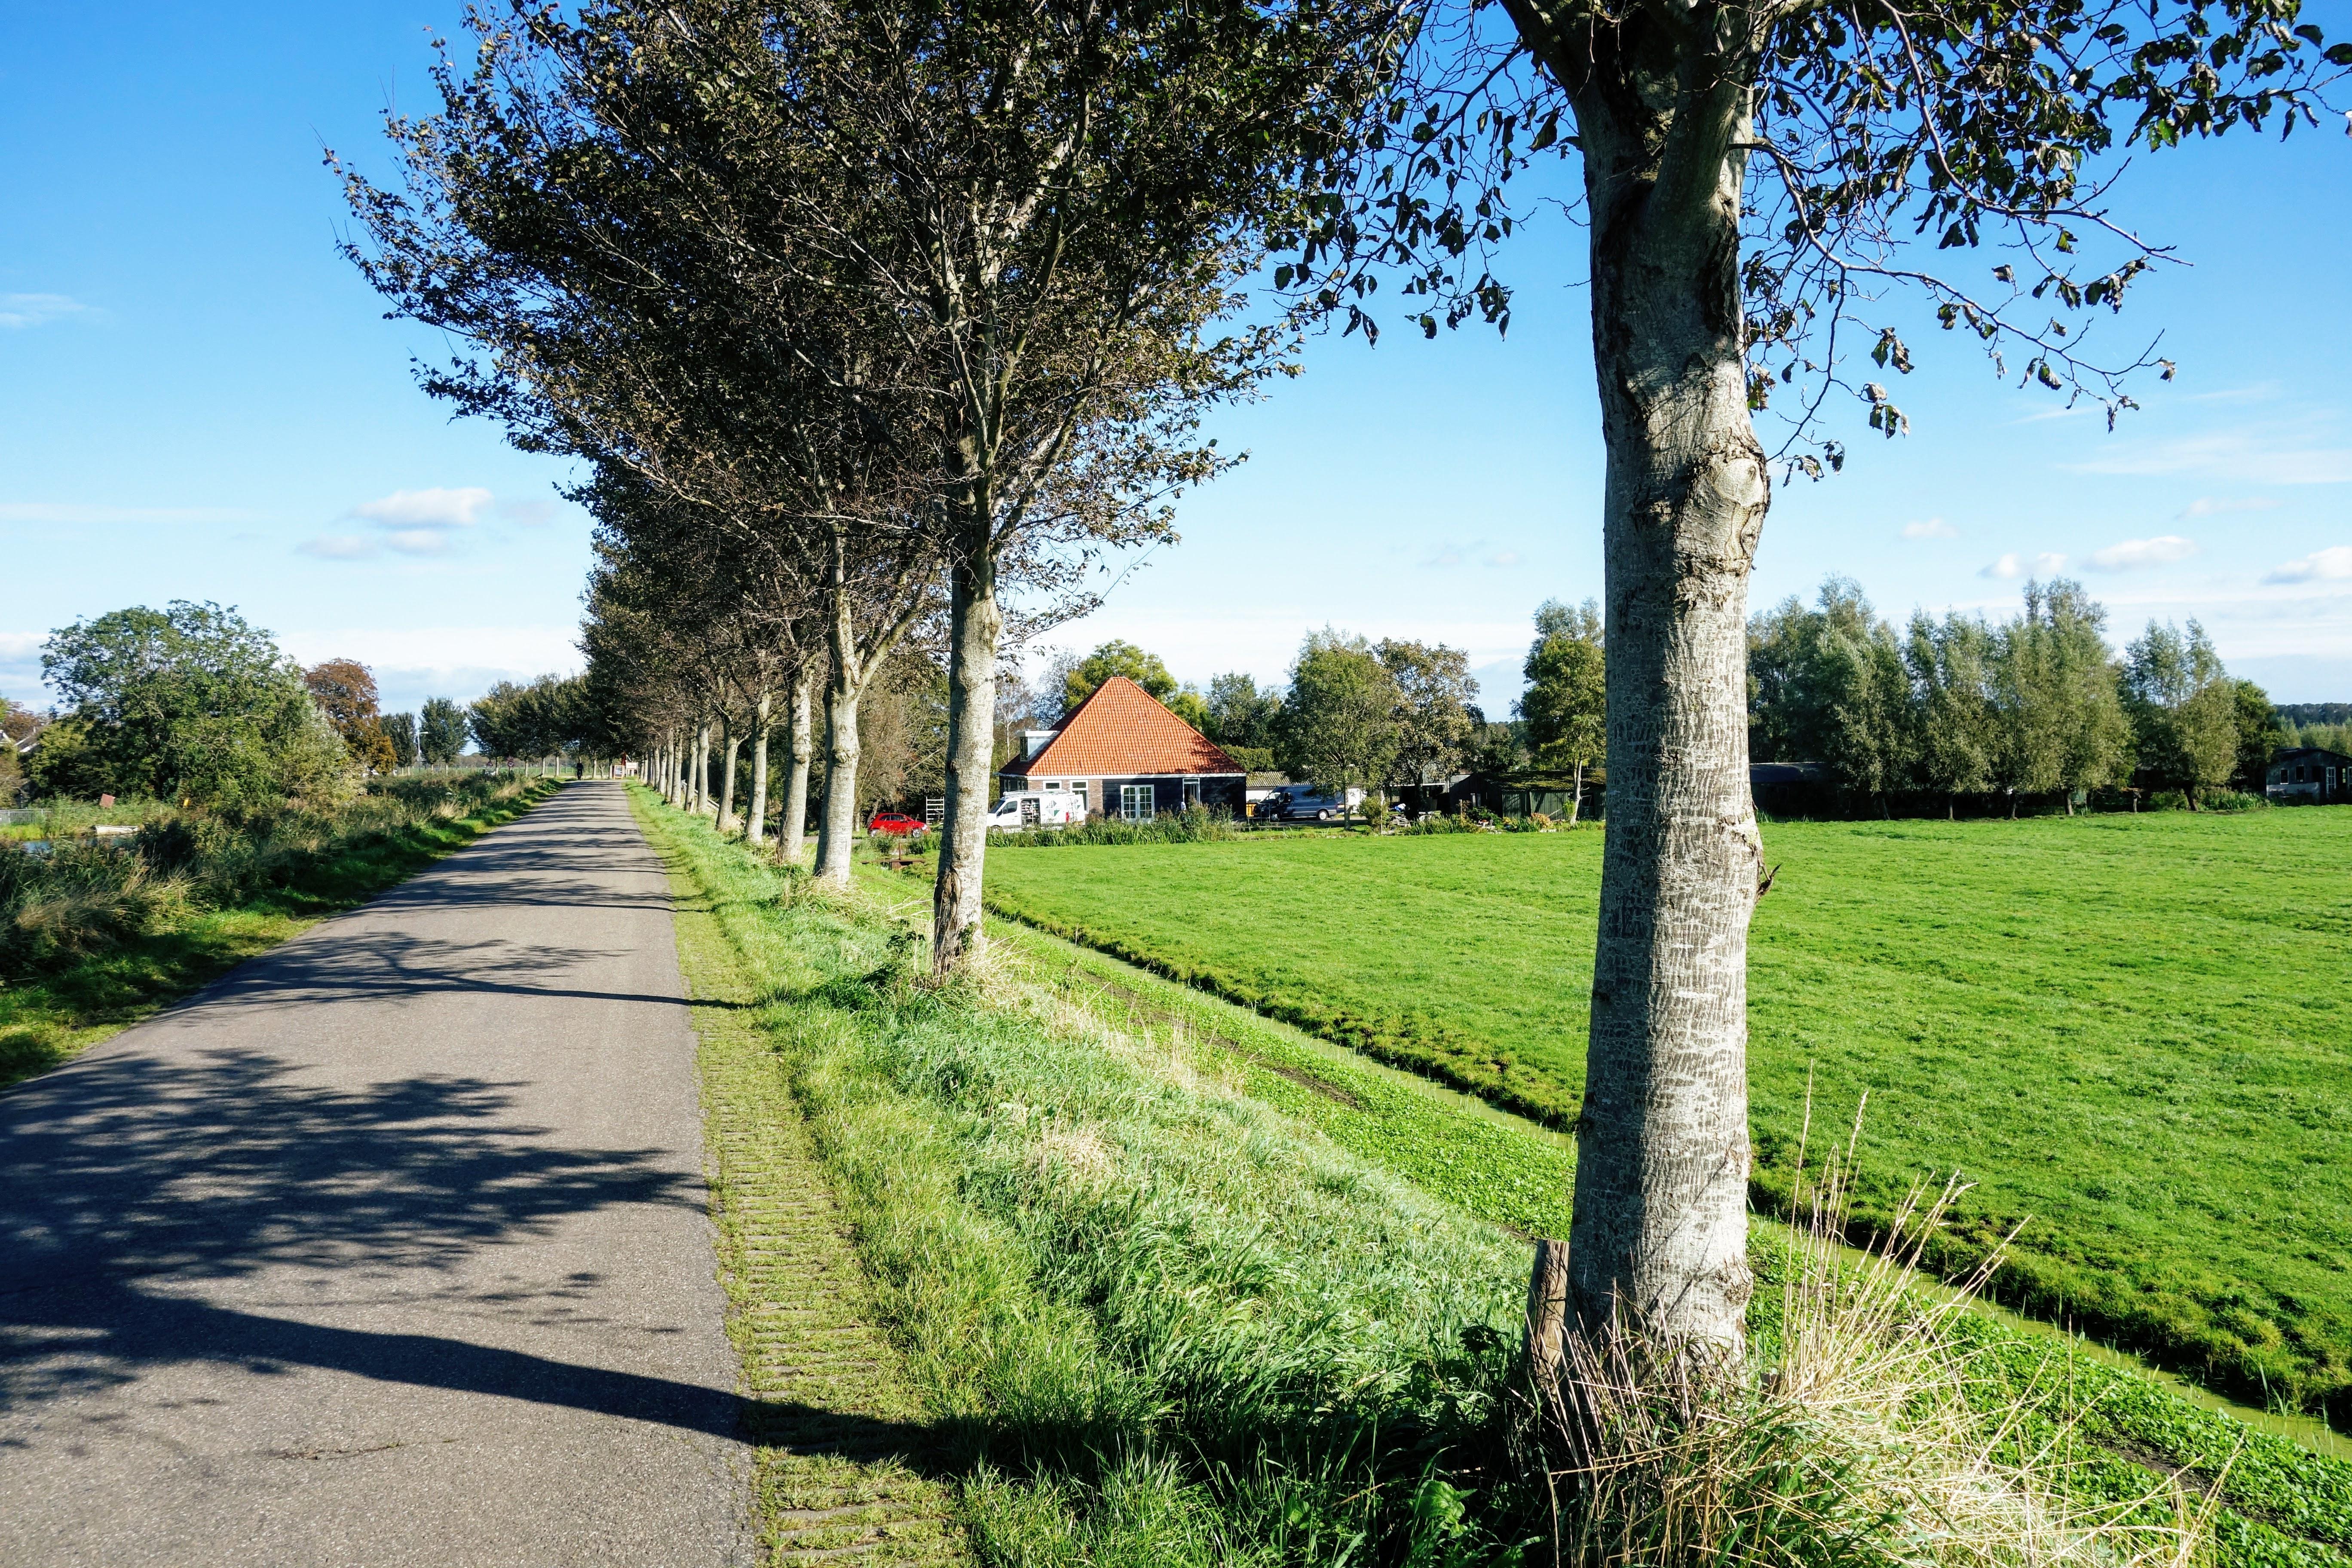 Ontdekkingstocht langs negen Nederlandse highlights